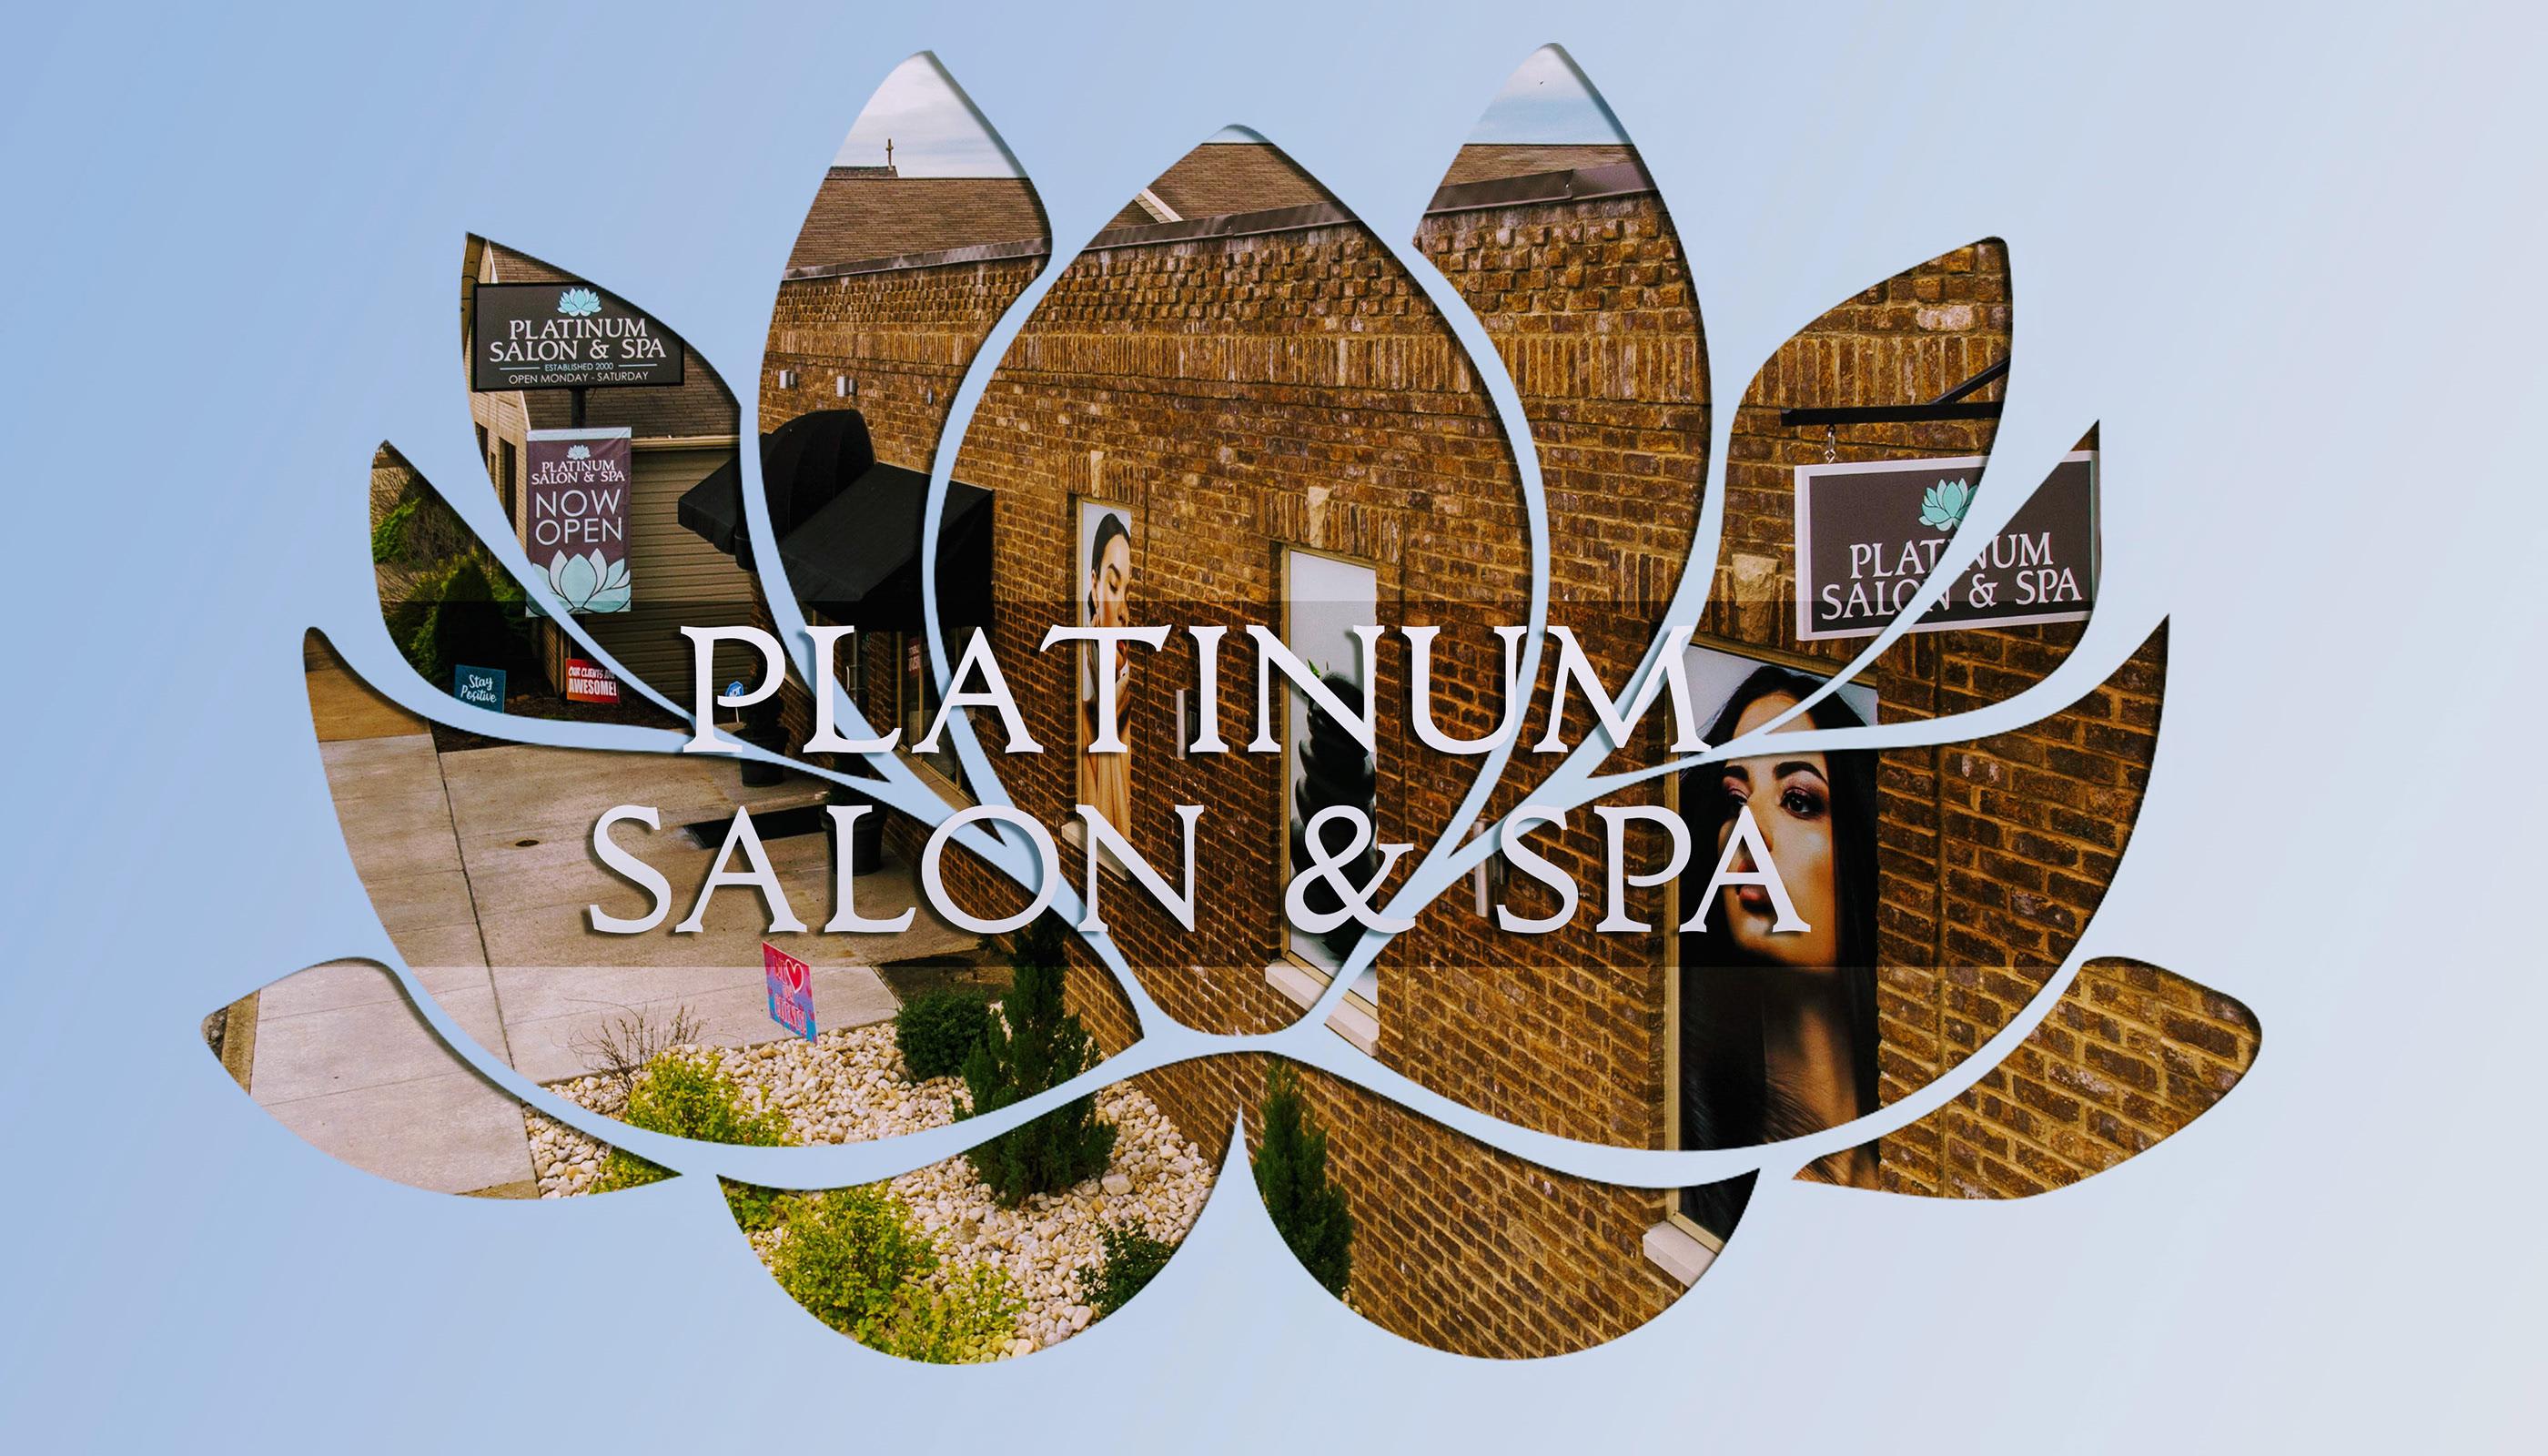 Video Production – Platinum Salon & Spa